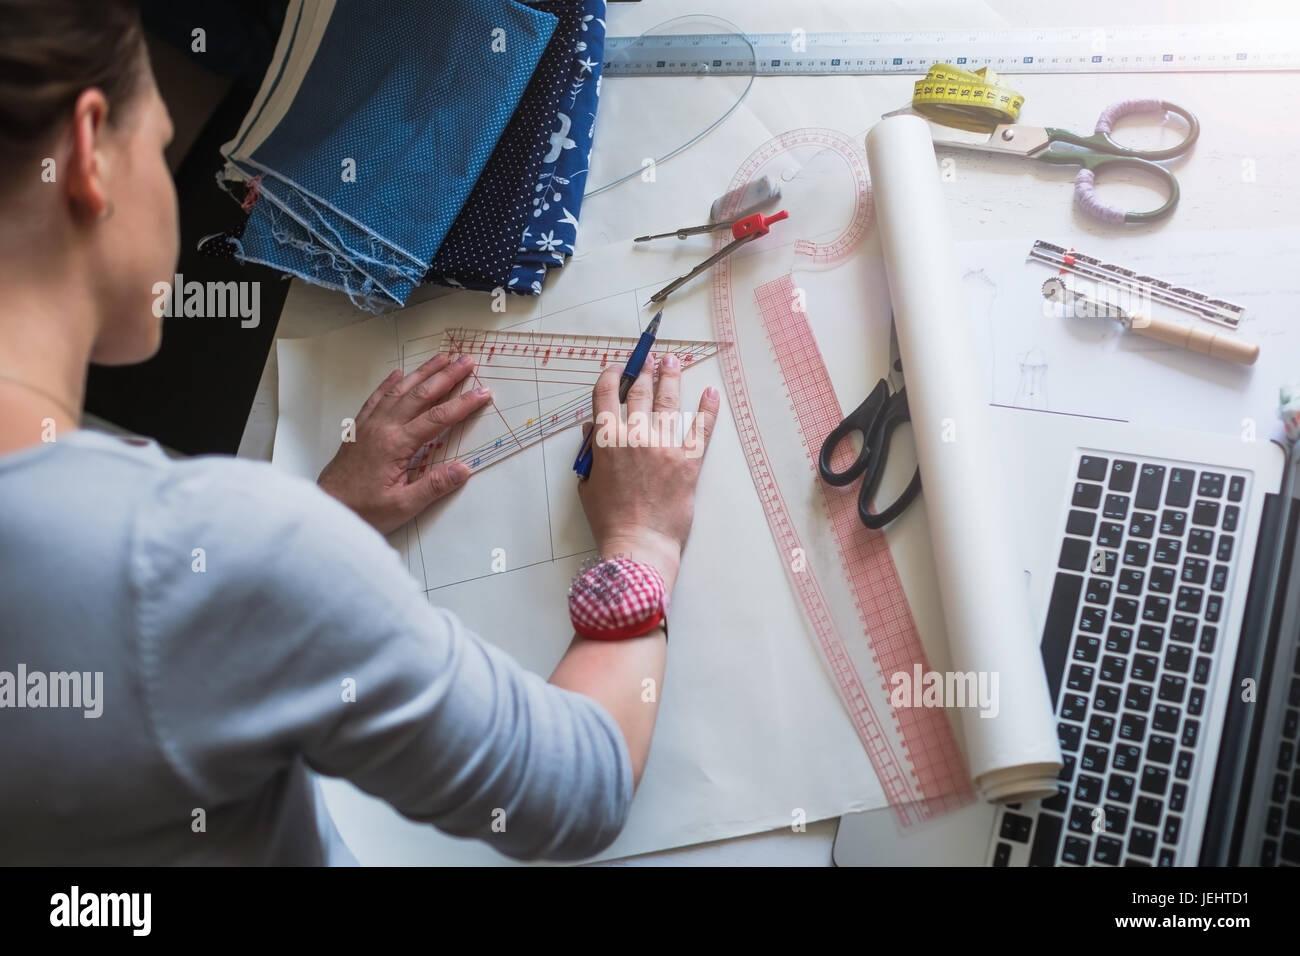 Fashion Designer Draw Scheme For Clothes Stock Photo Alamy